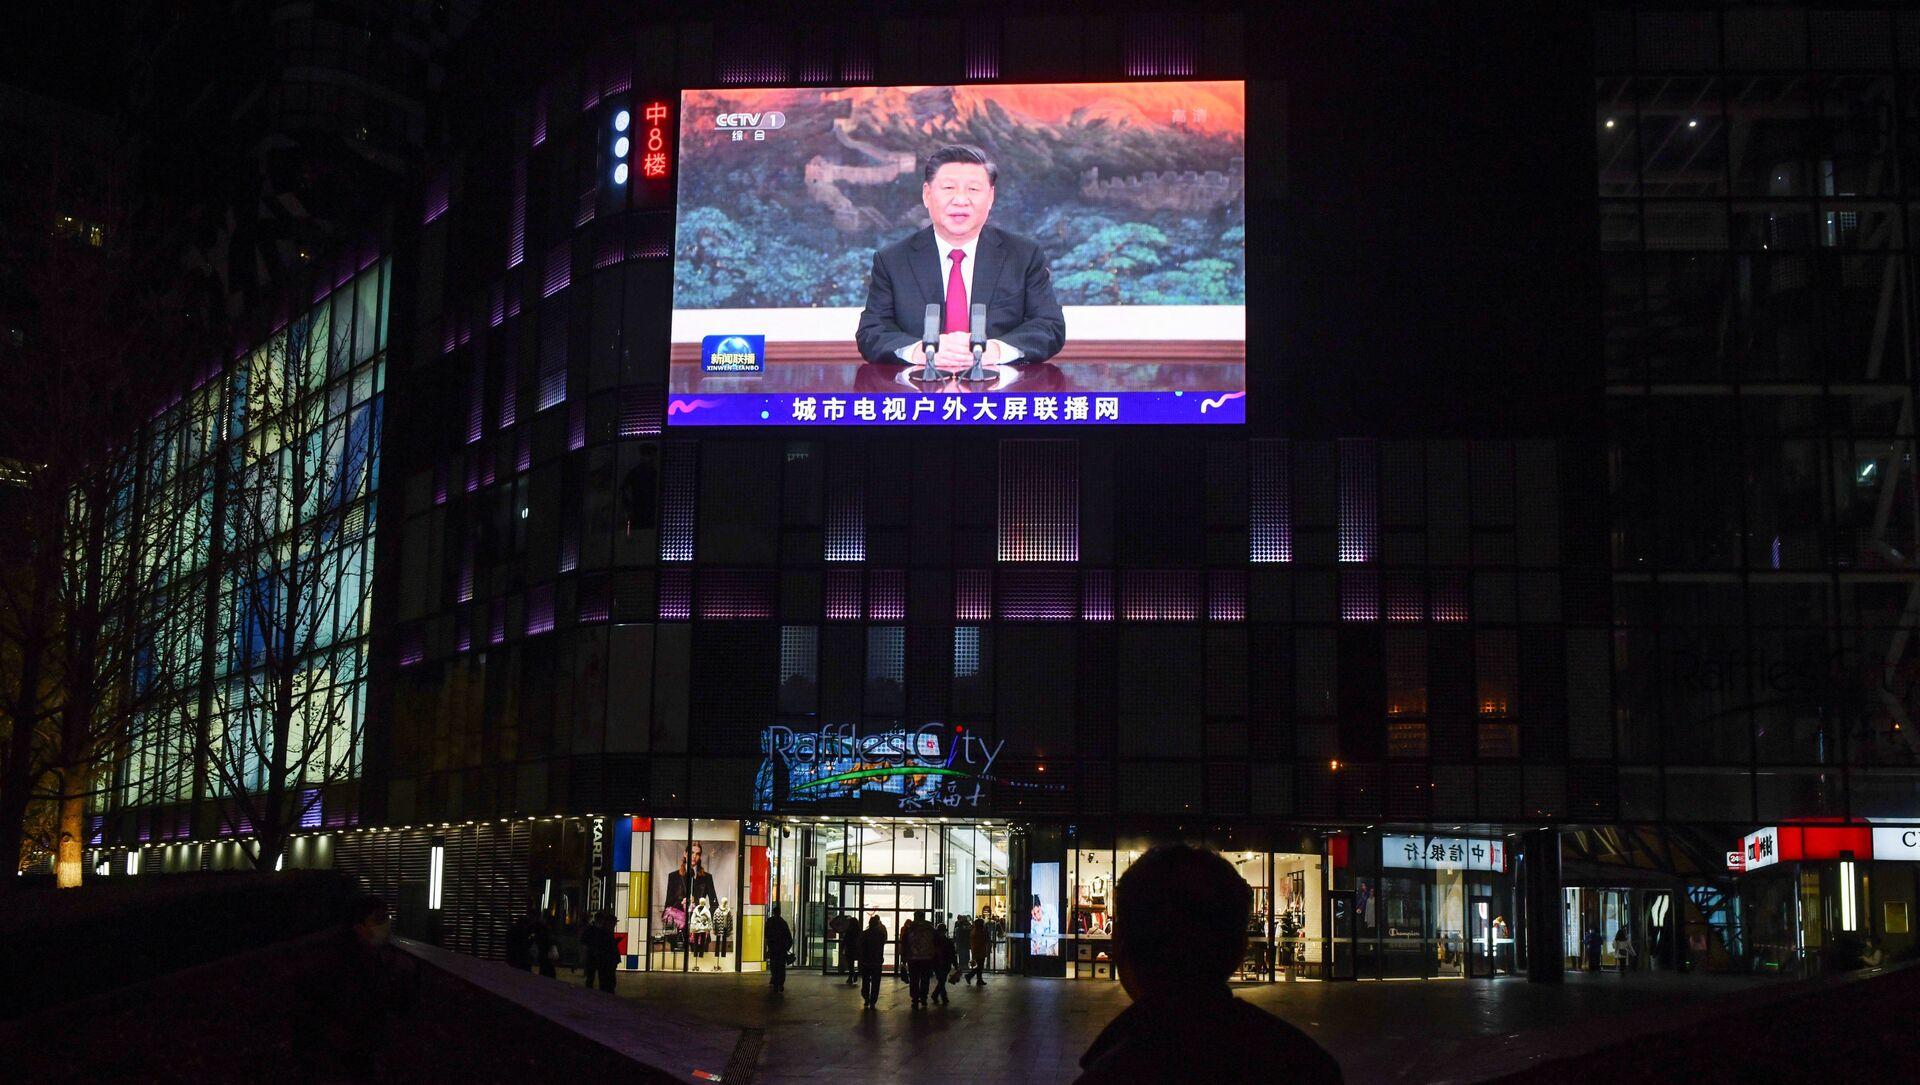 Xi Jinping, presidente de China, durante un discurso transmitido en una pantalla de Pekín, China (archivo) - Sputnik Mundo, 1920, 22.11.2020